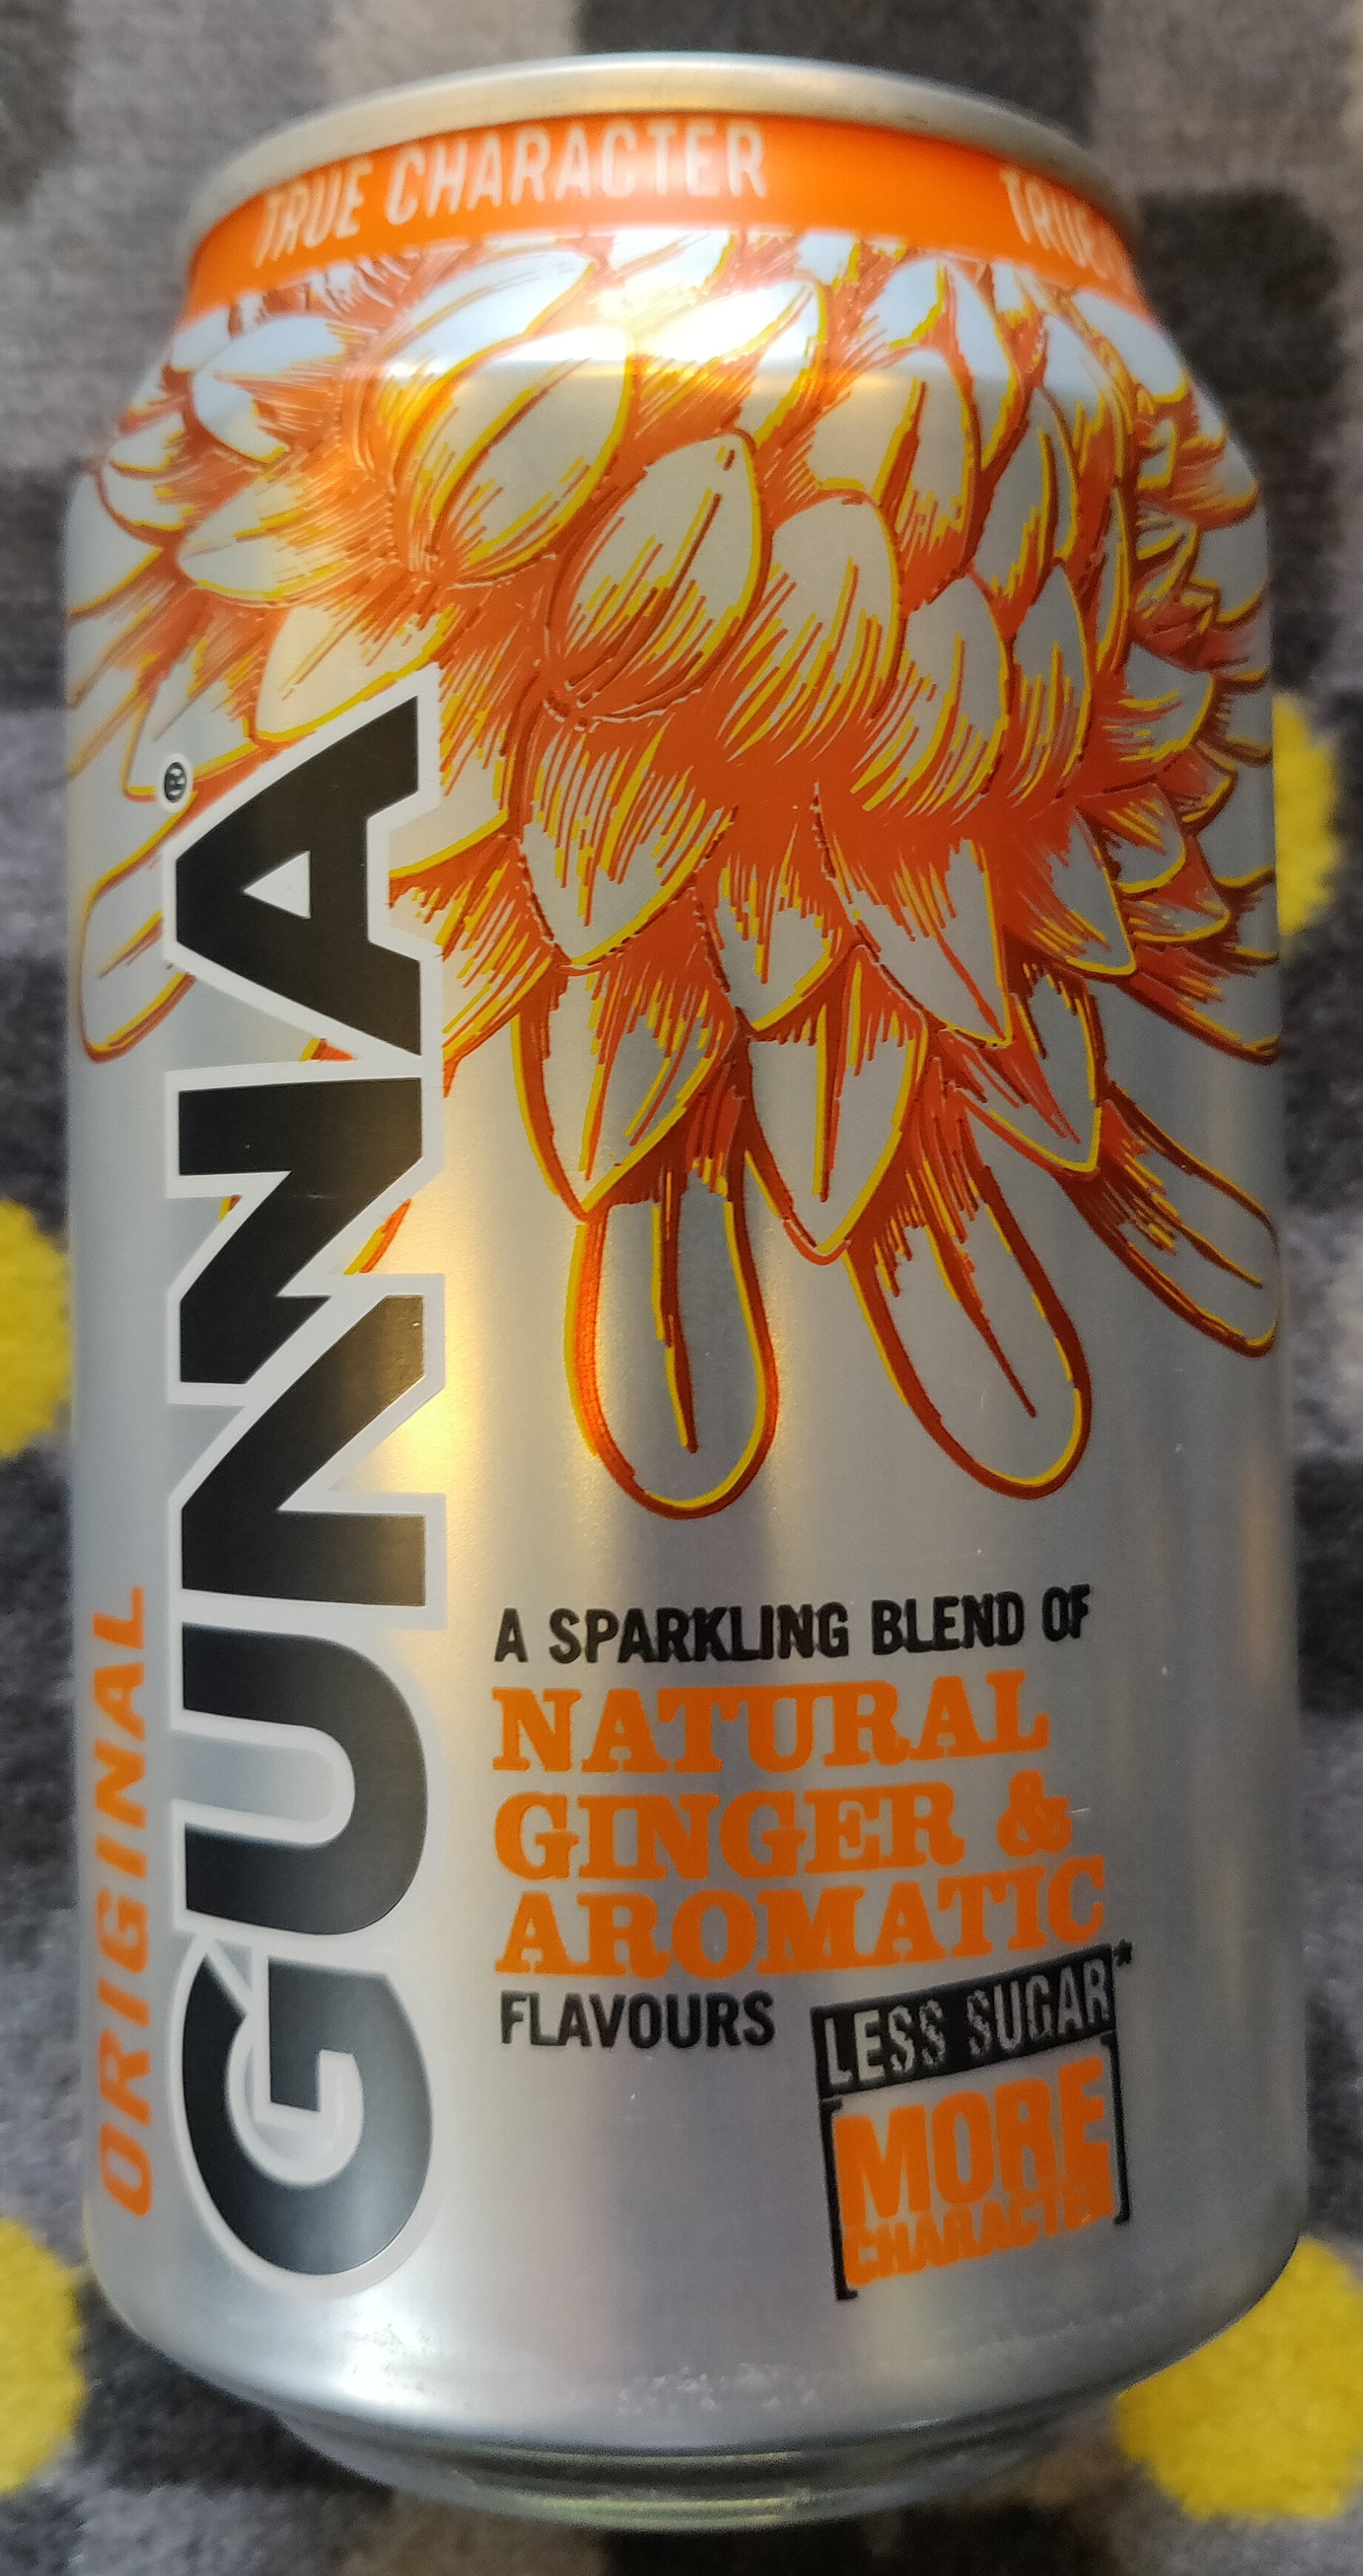 Original Gunna Natural Ginger & Aromatic - Produit - en